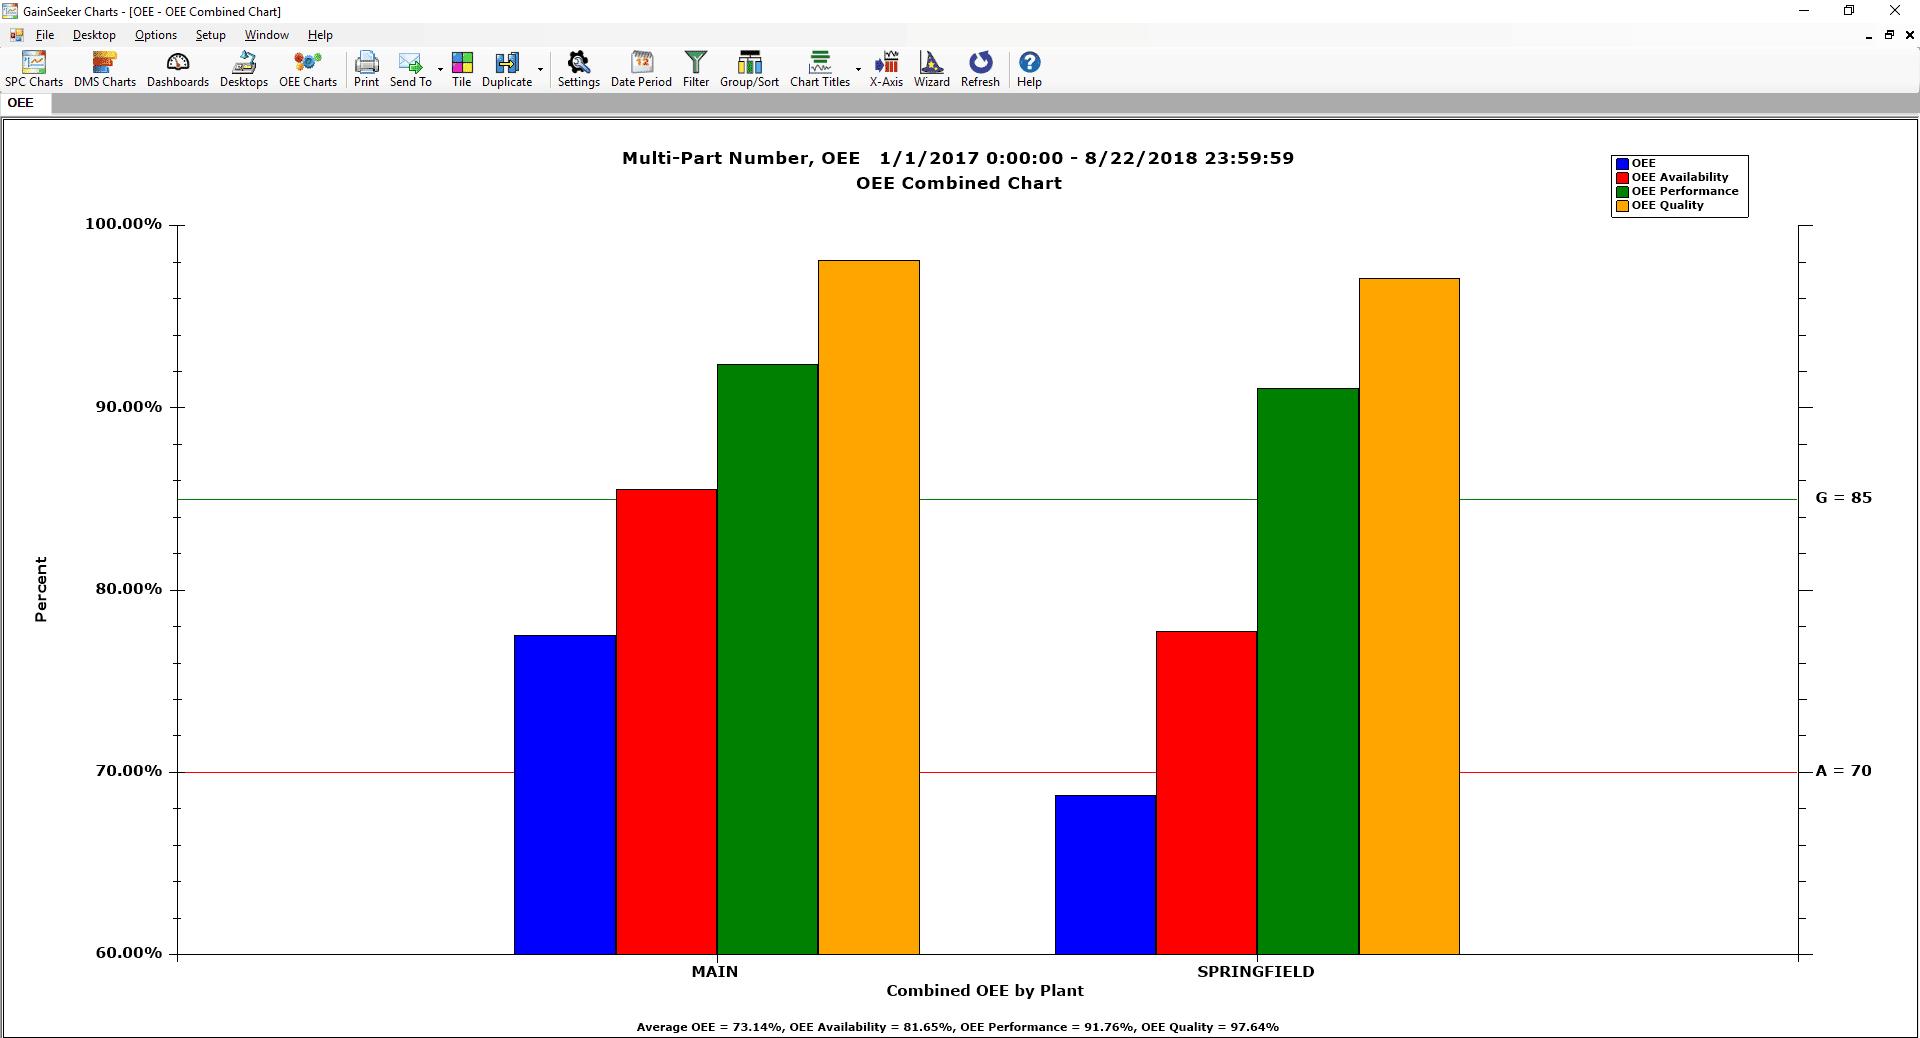 GainSeeker Overall Equipment Effectiveness (OEE) Combined Chart